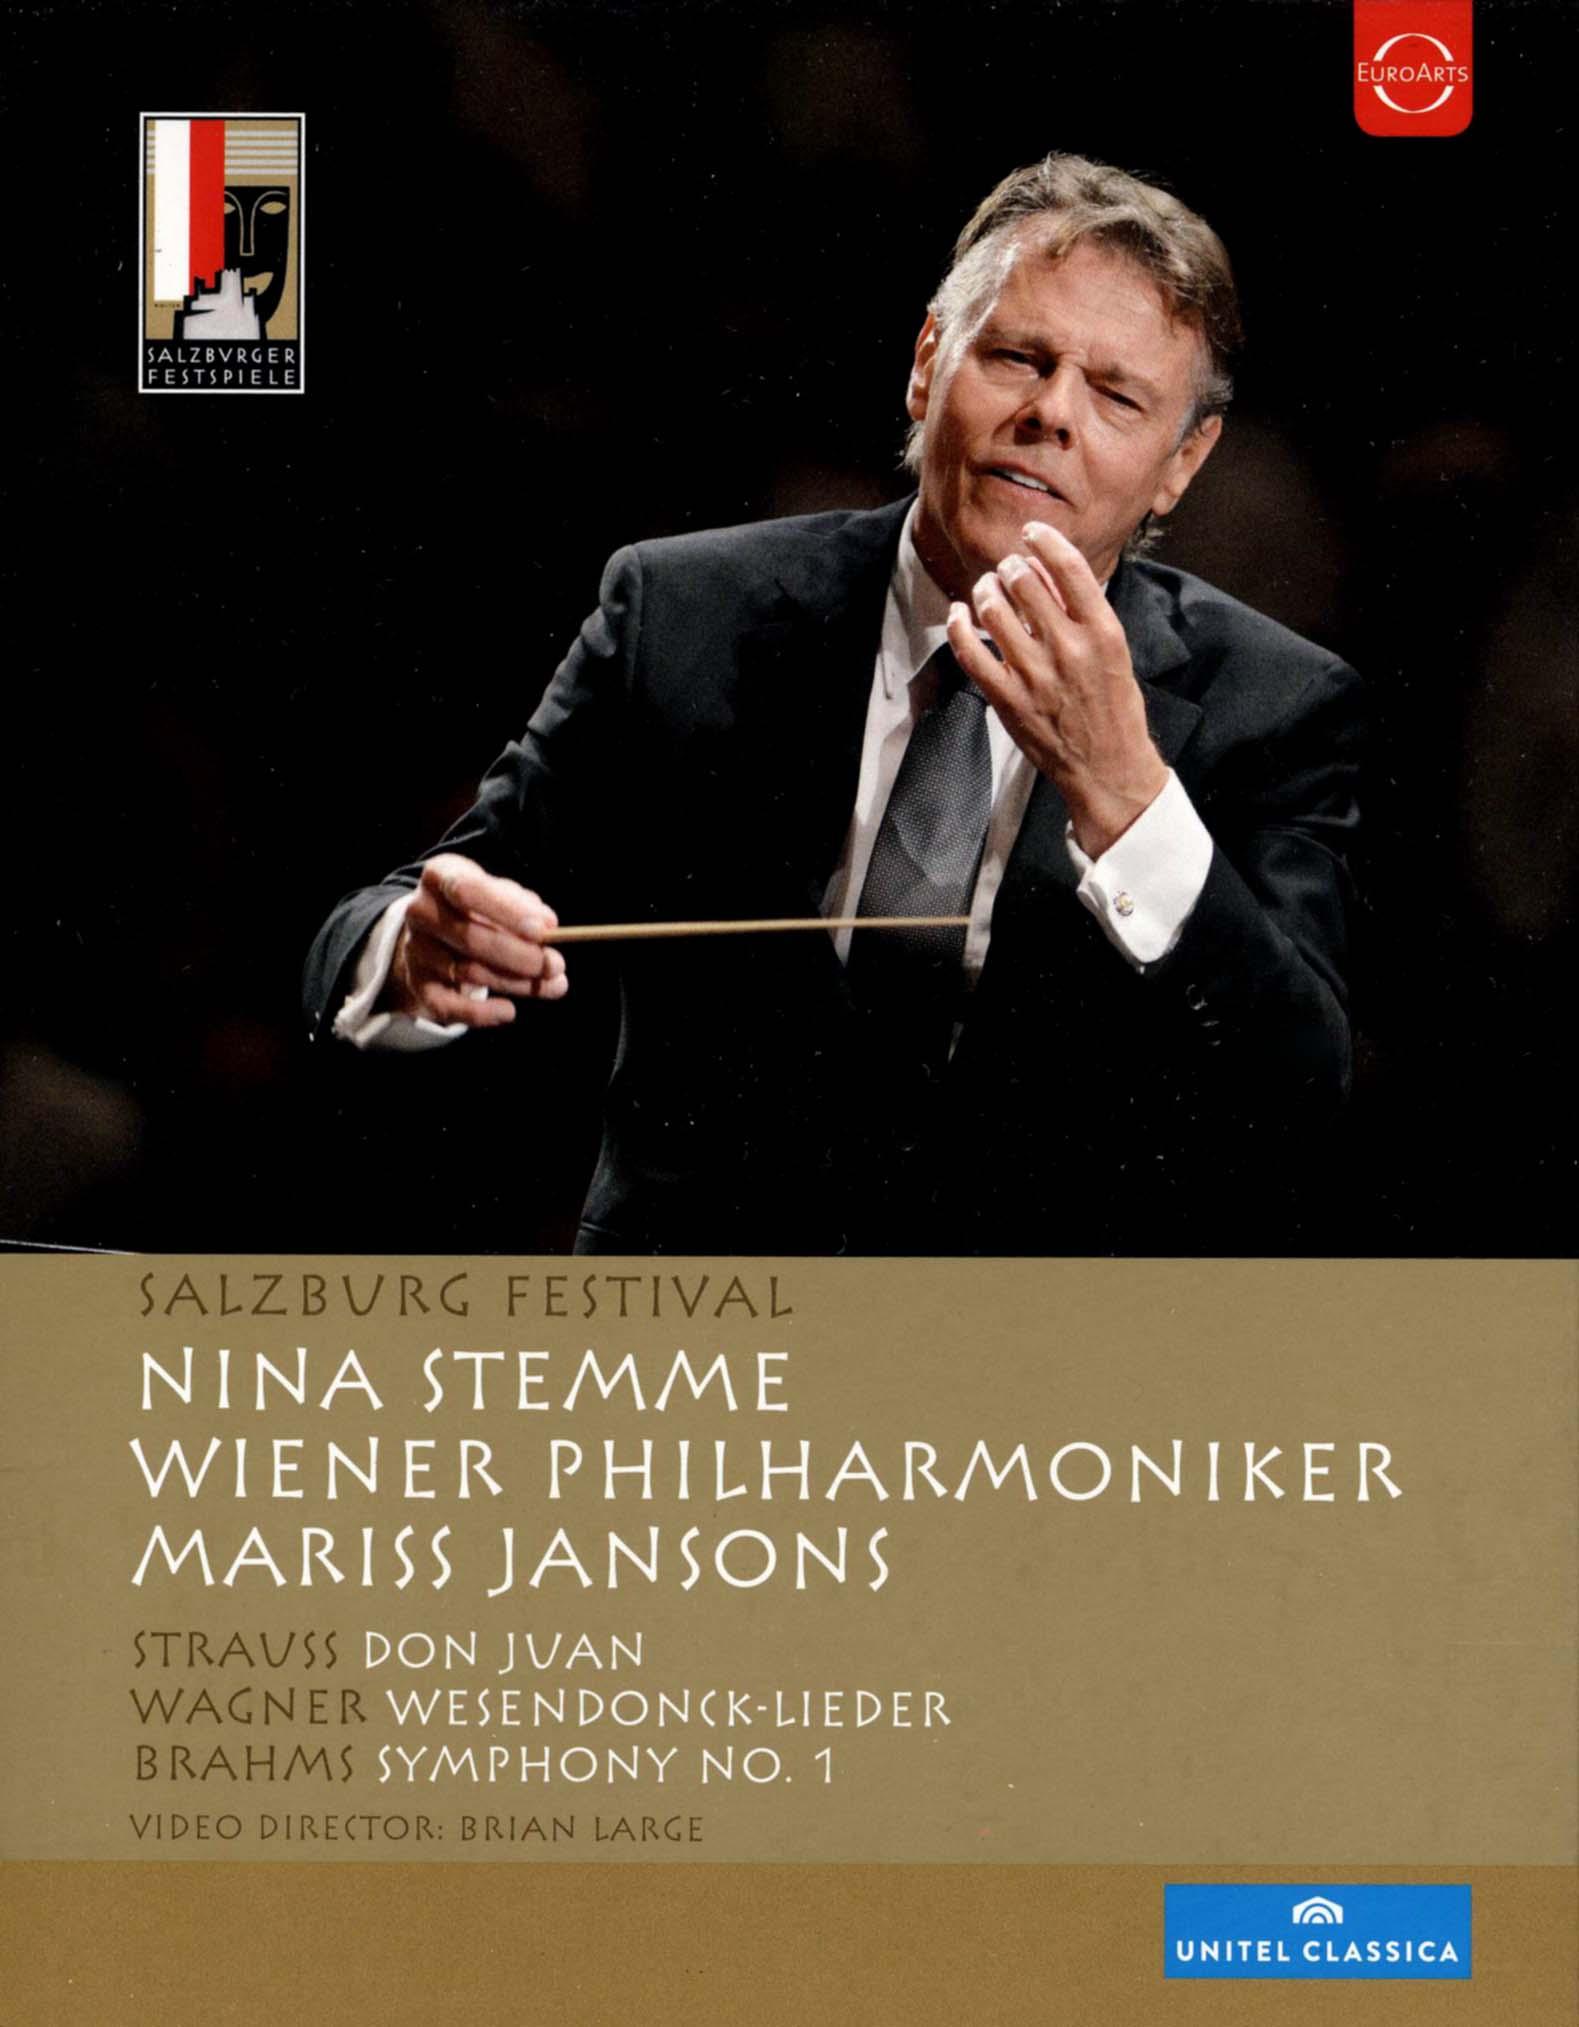 Salzburg Festival 2012: Strauss/Wagner/Brahms